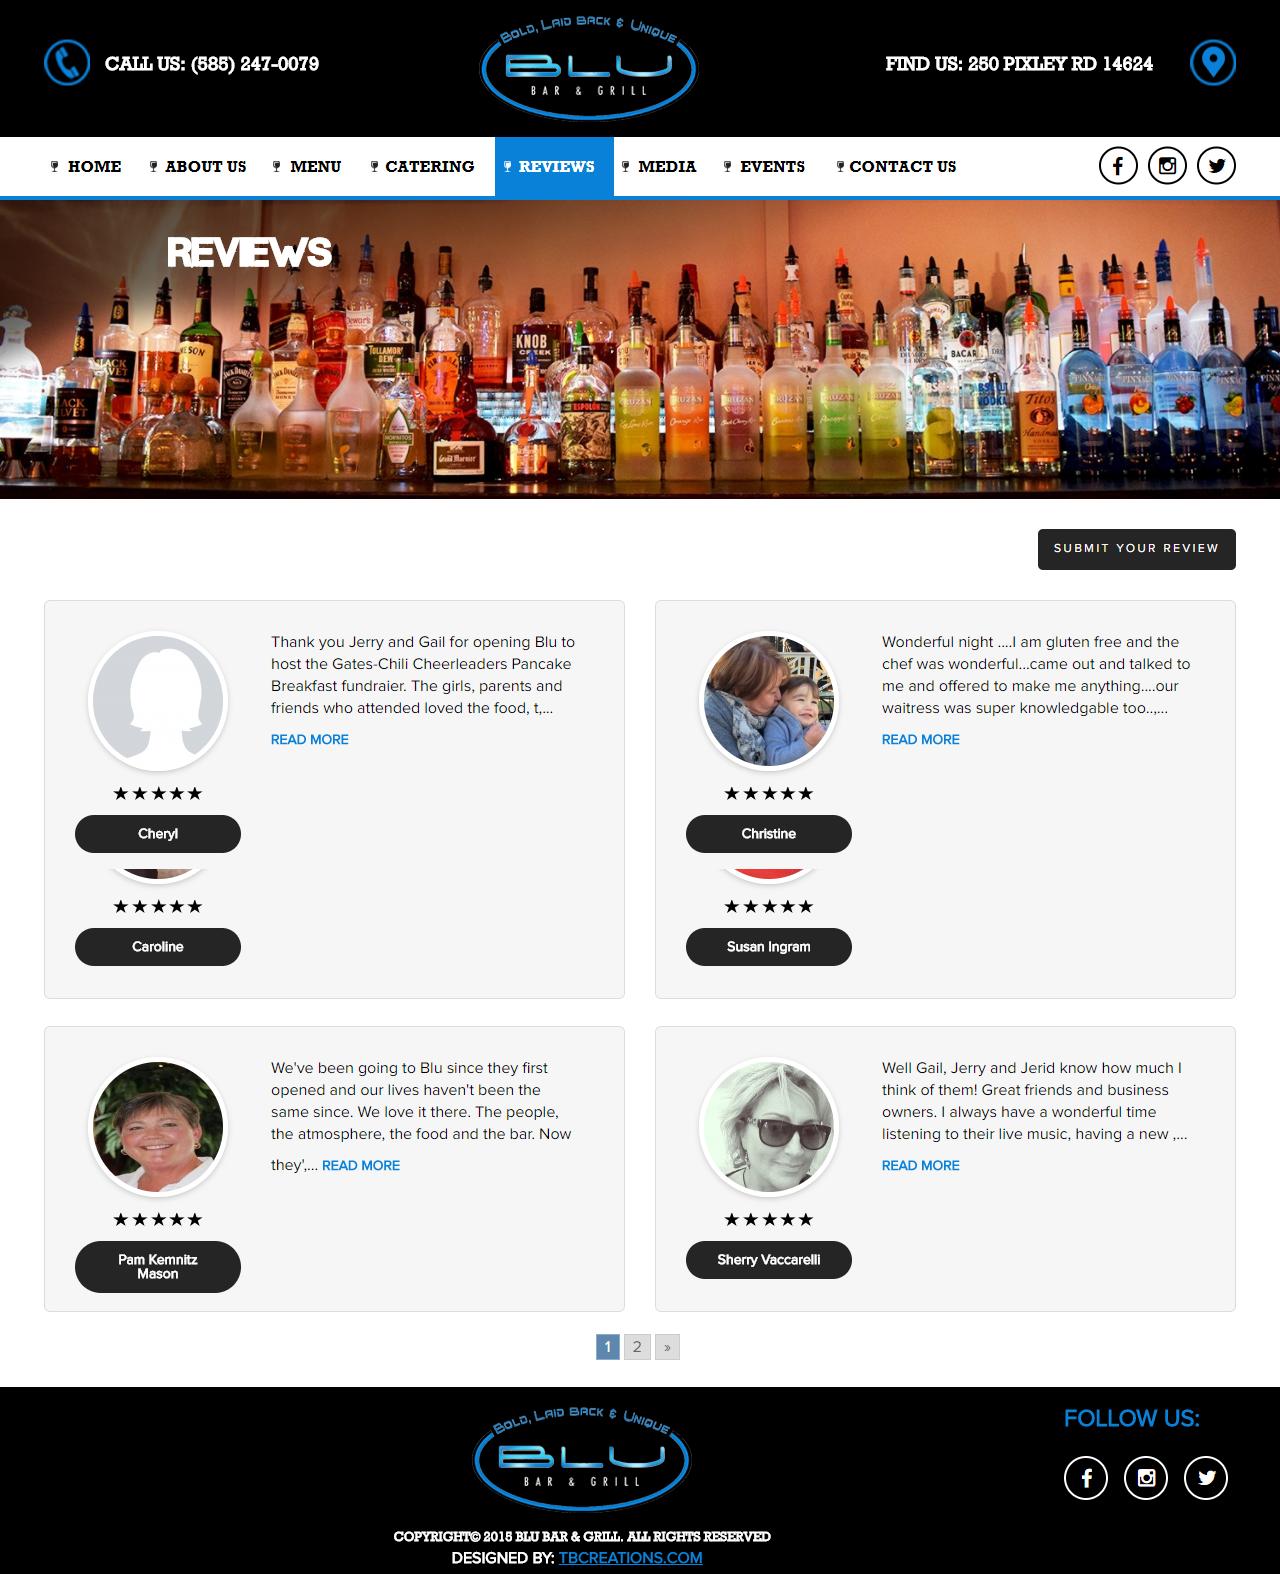 BLU Bar & Grill Website